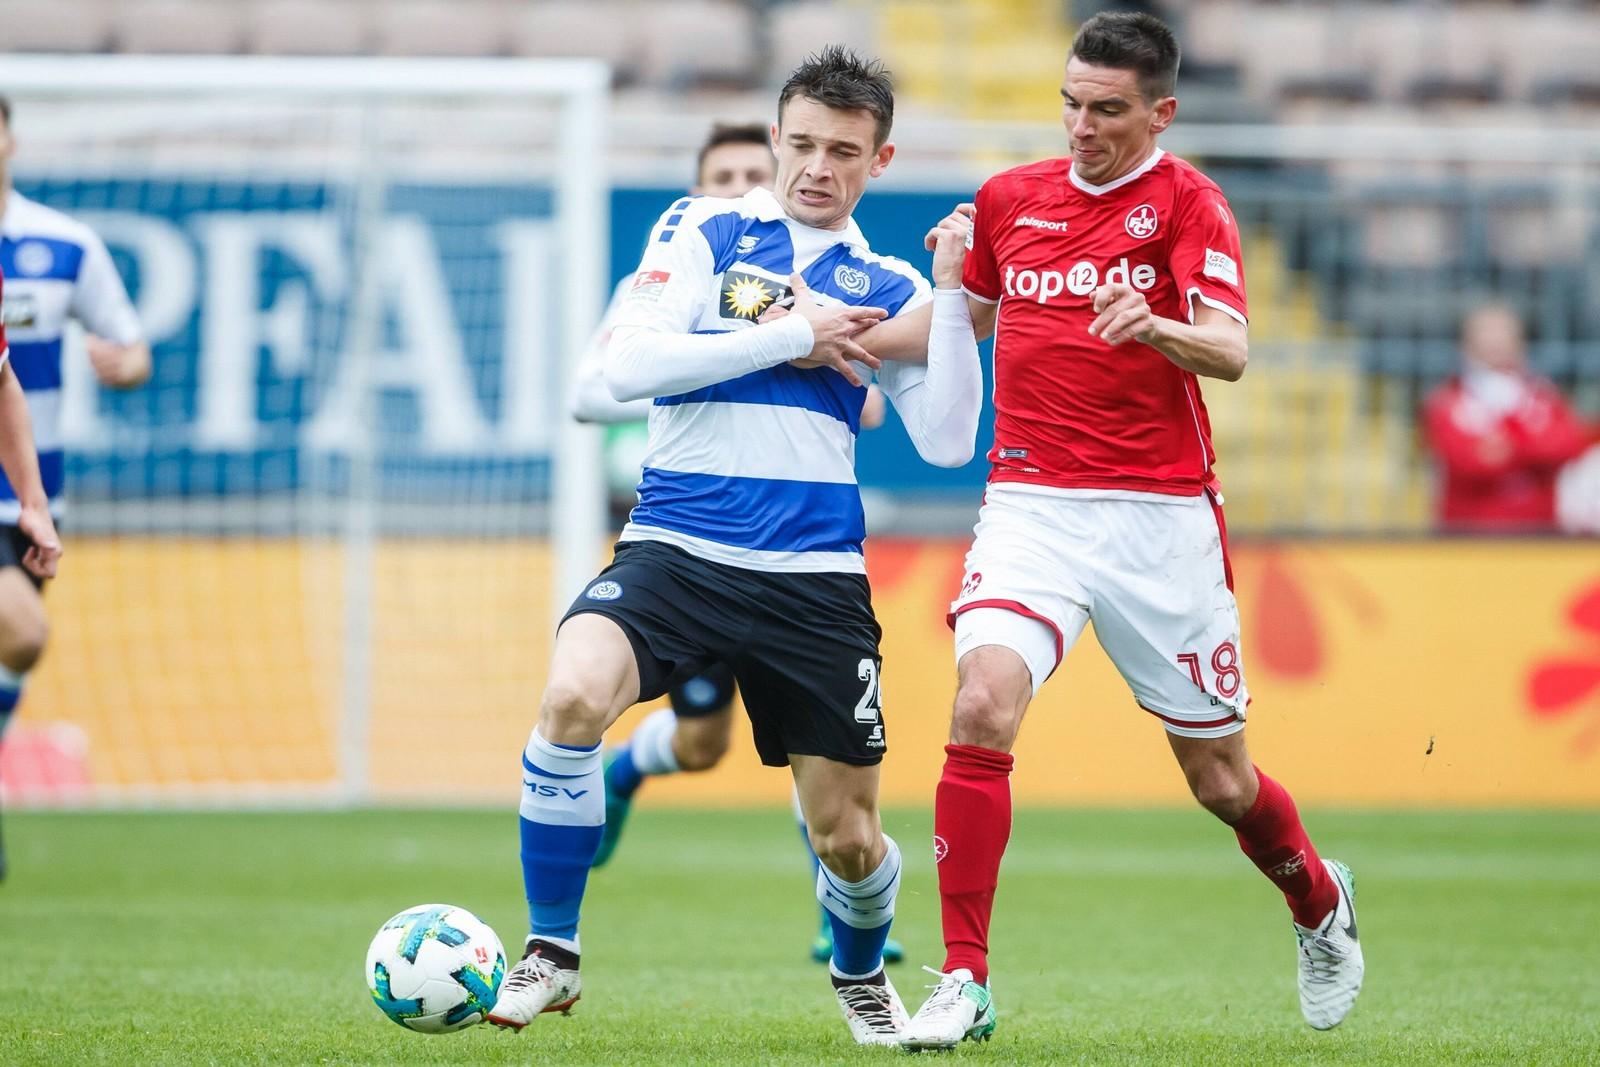 Boris Tashchy vom MSV Duisburg gegen Christoph Moritz vom 1. FC Kaiserslautern